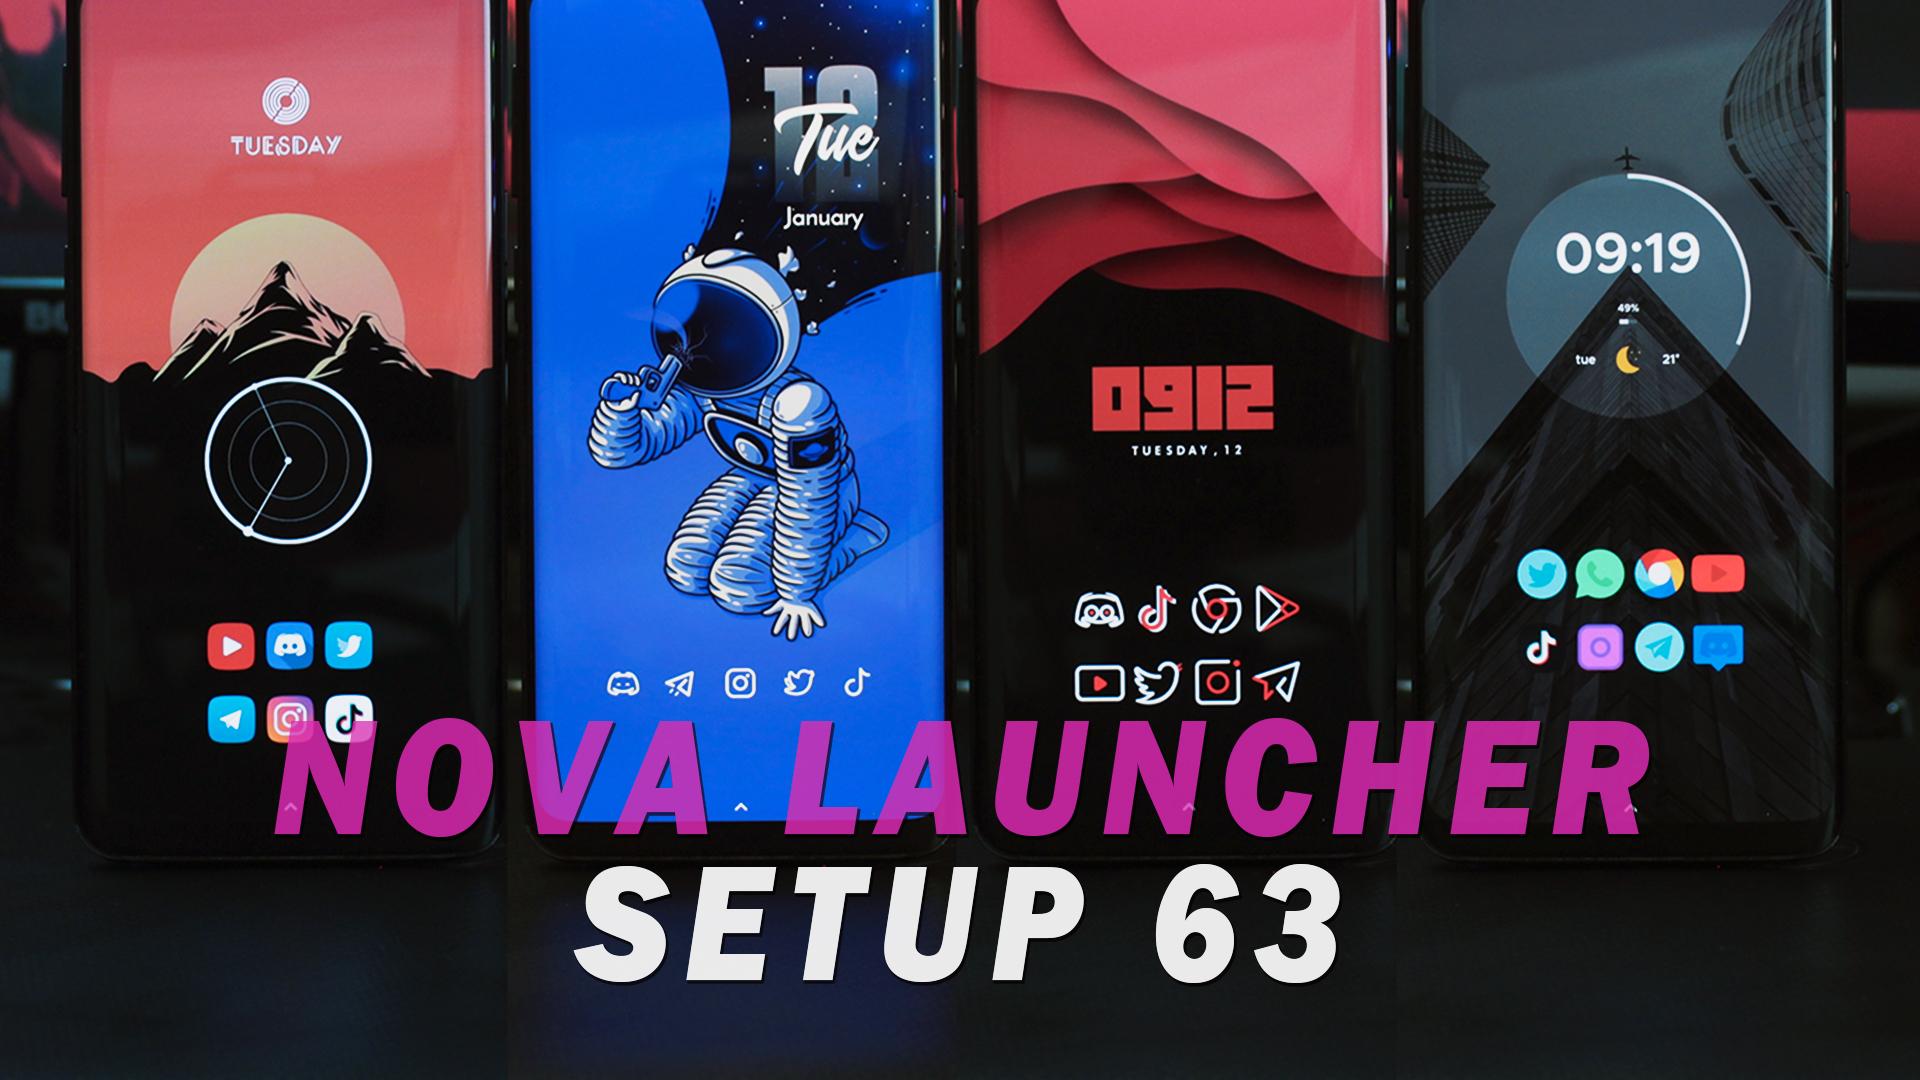 4 Personalizaciones Android al Extremo!   Nova Launcher Setup 63